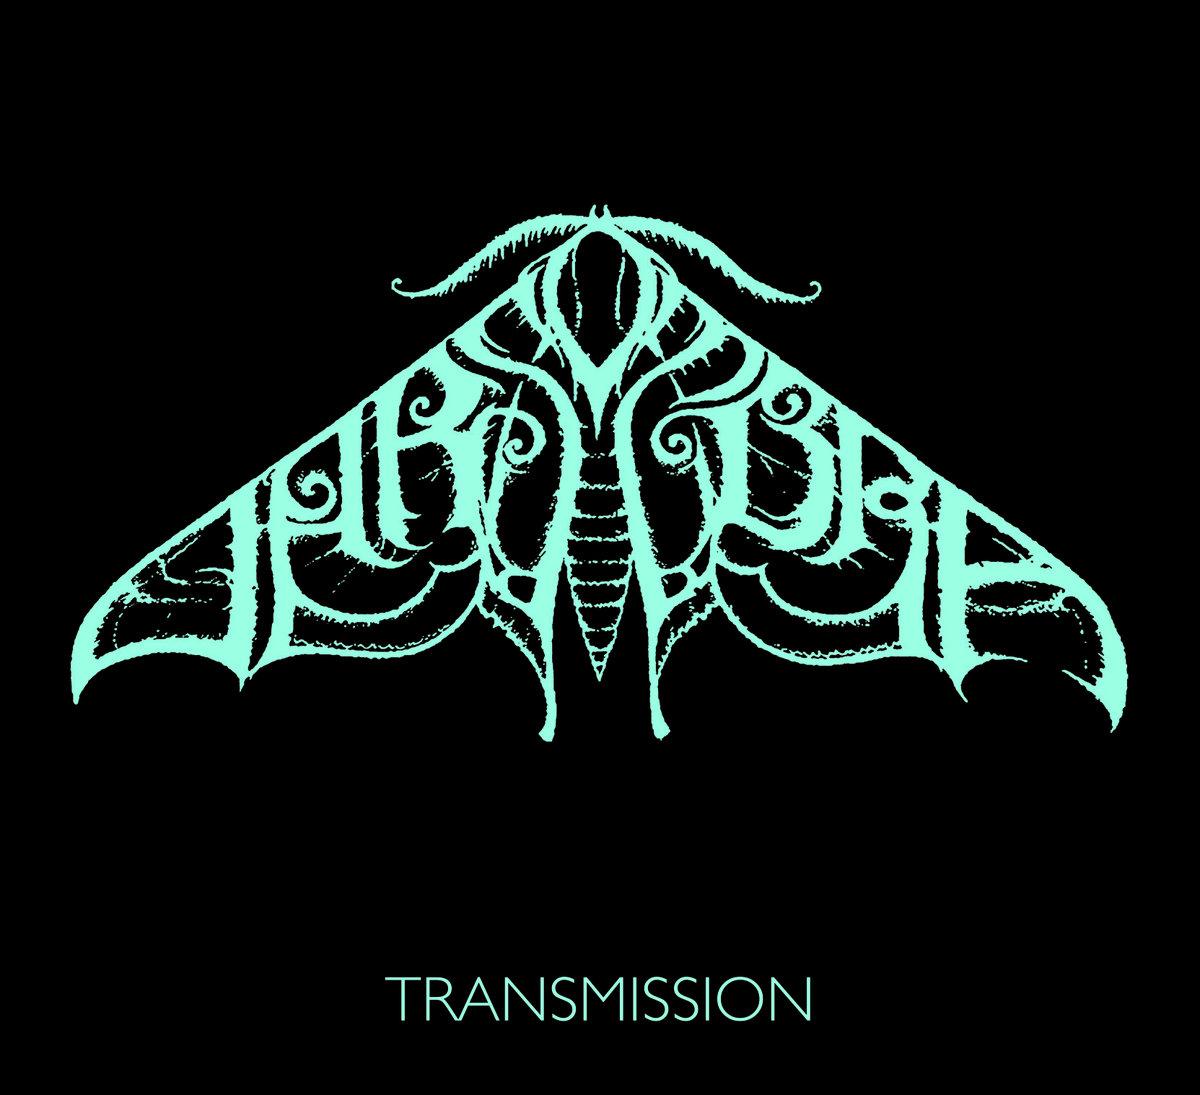 Darsombra Transmission